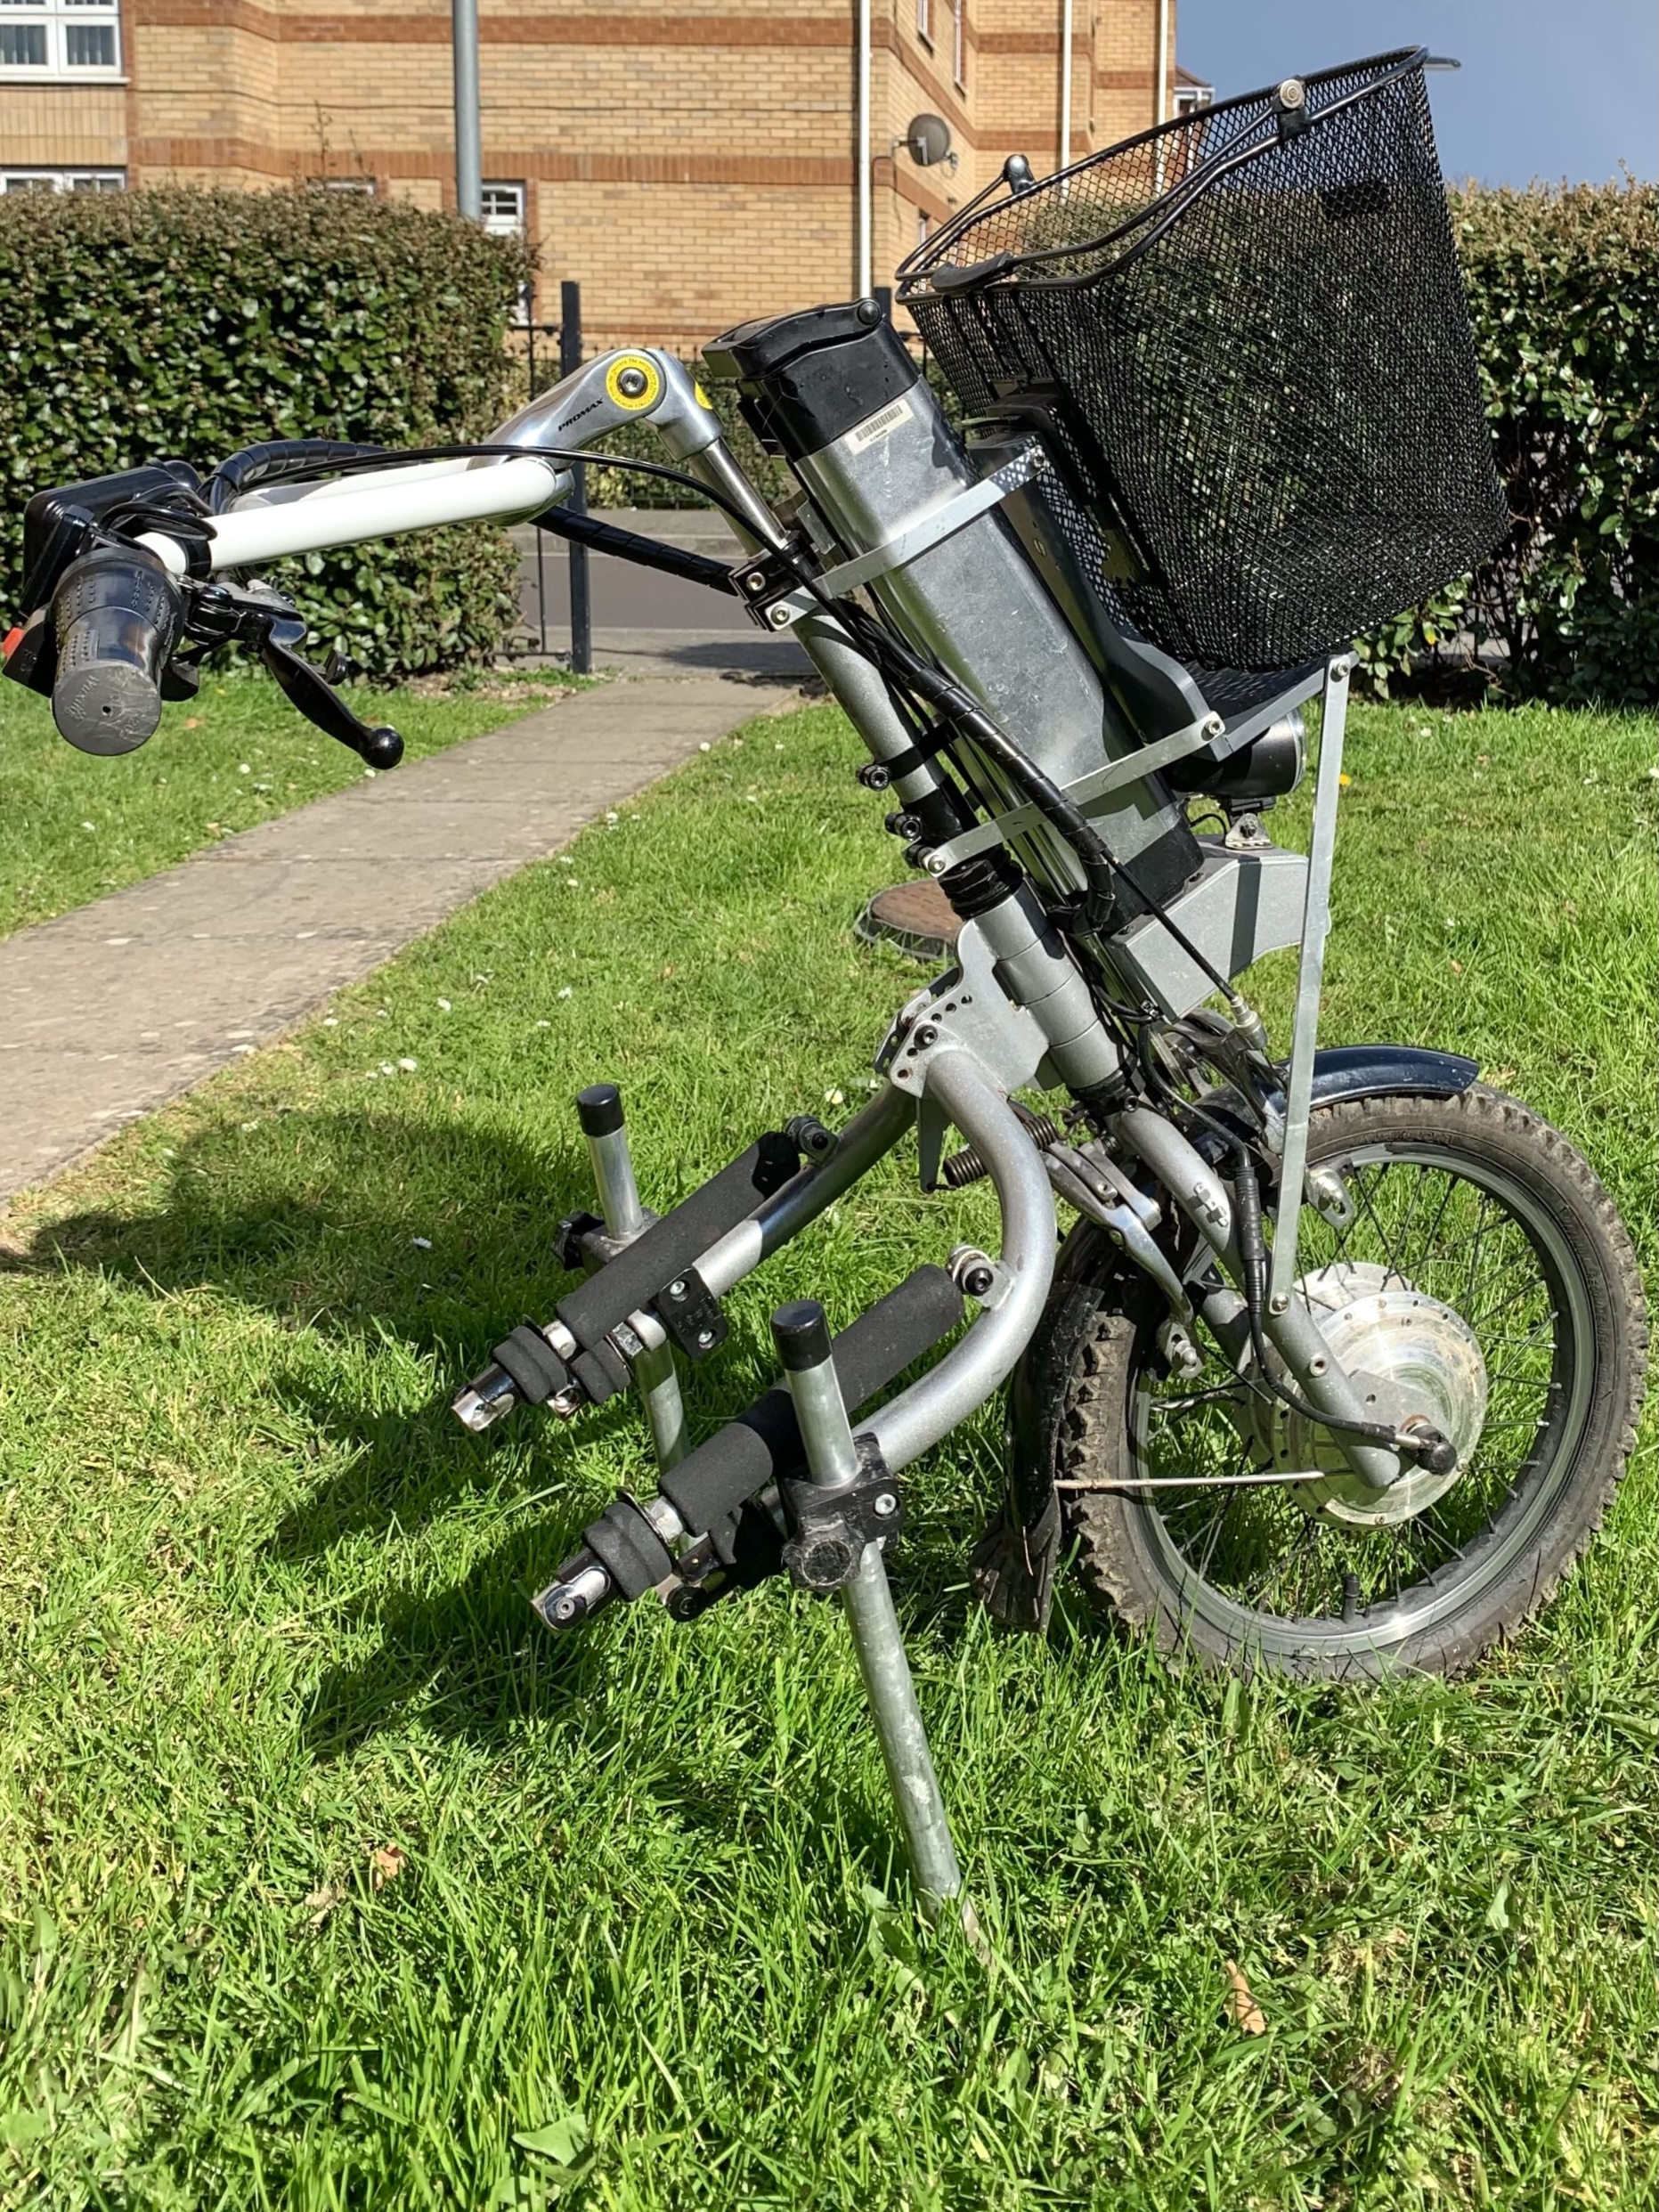 Firefly Electric Bike